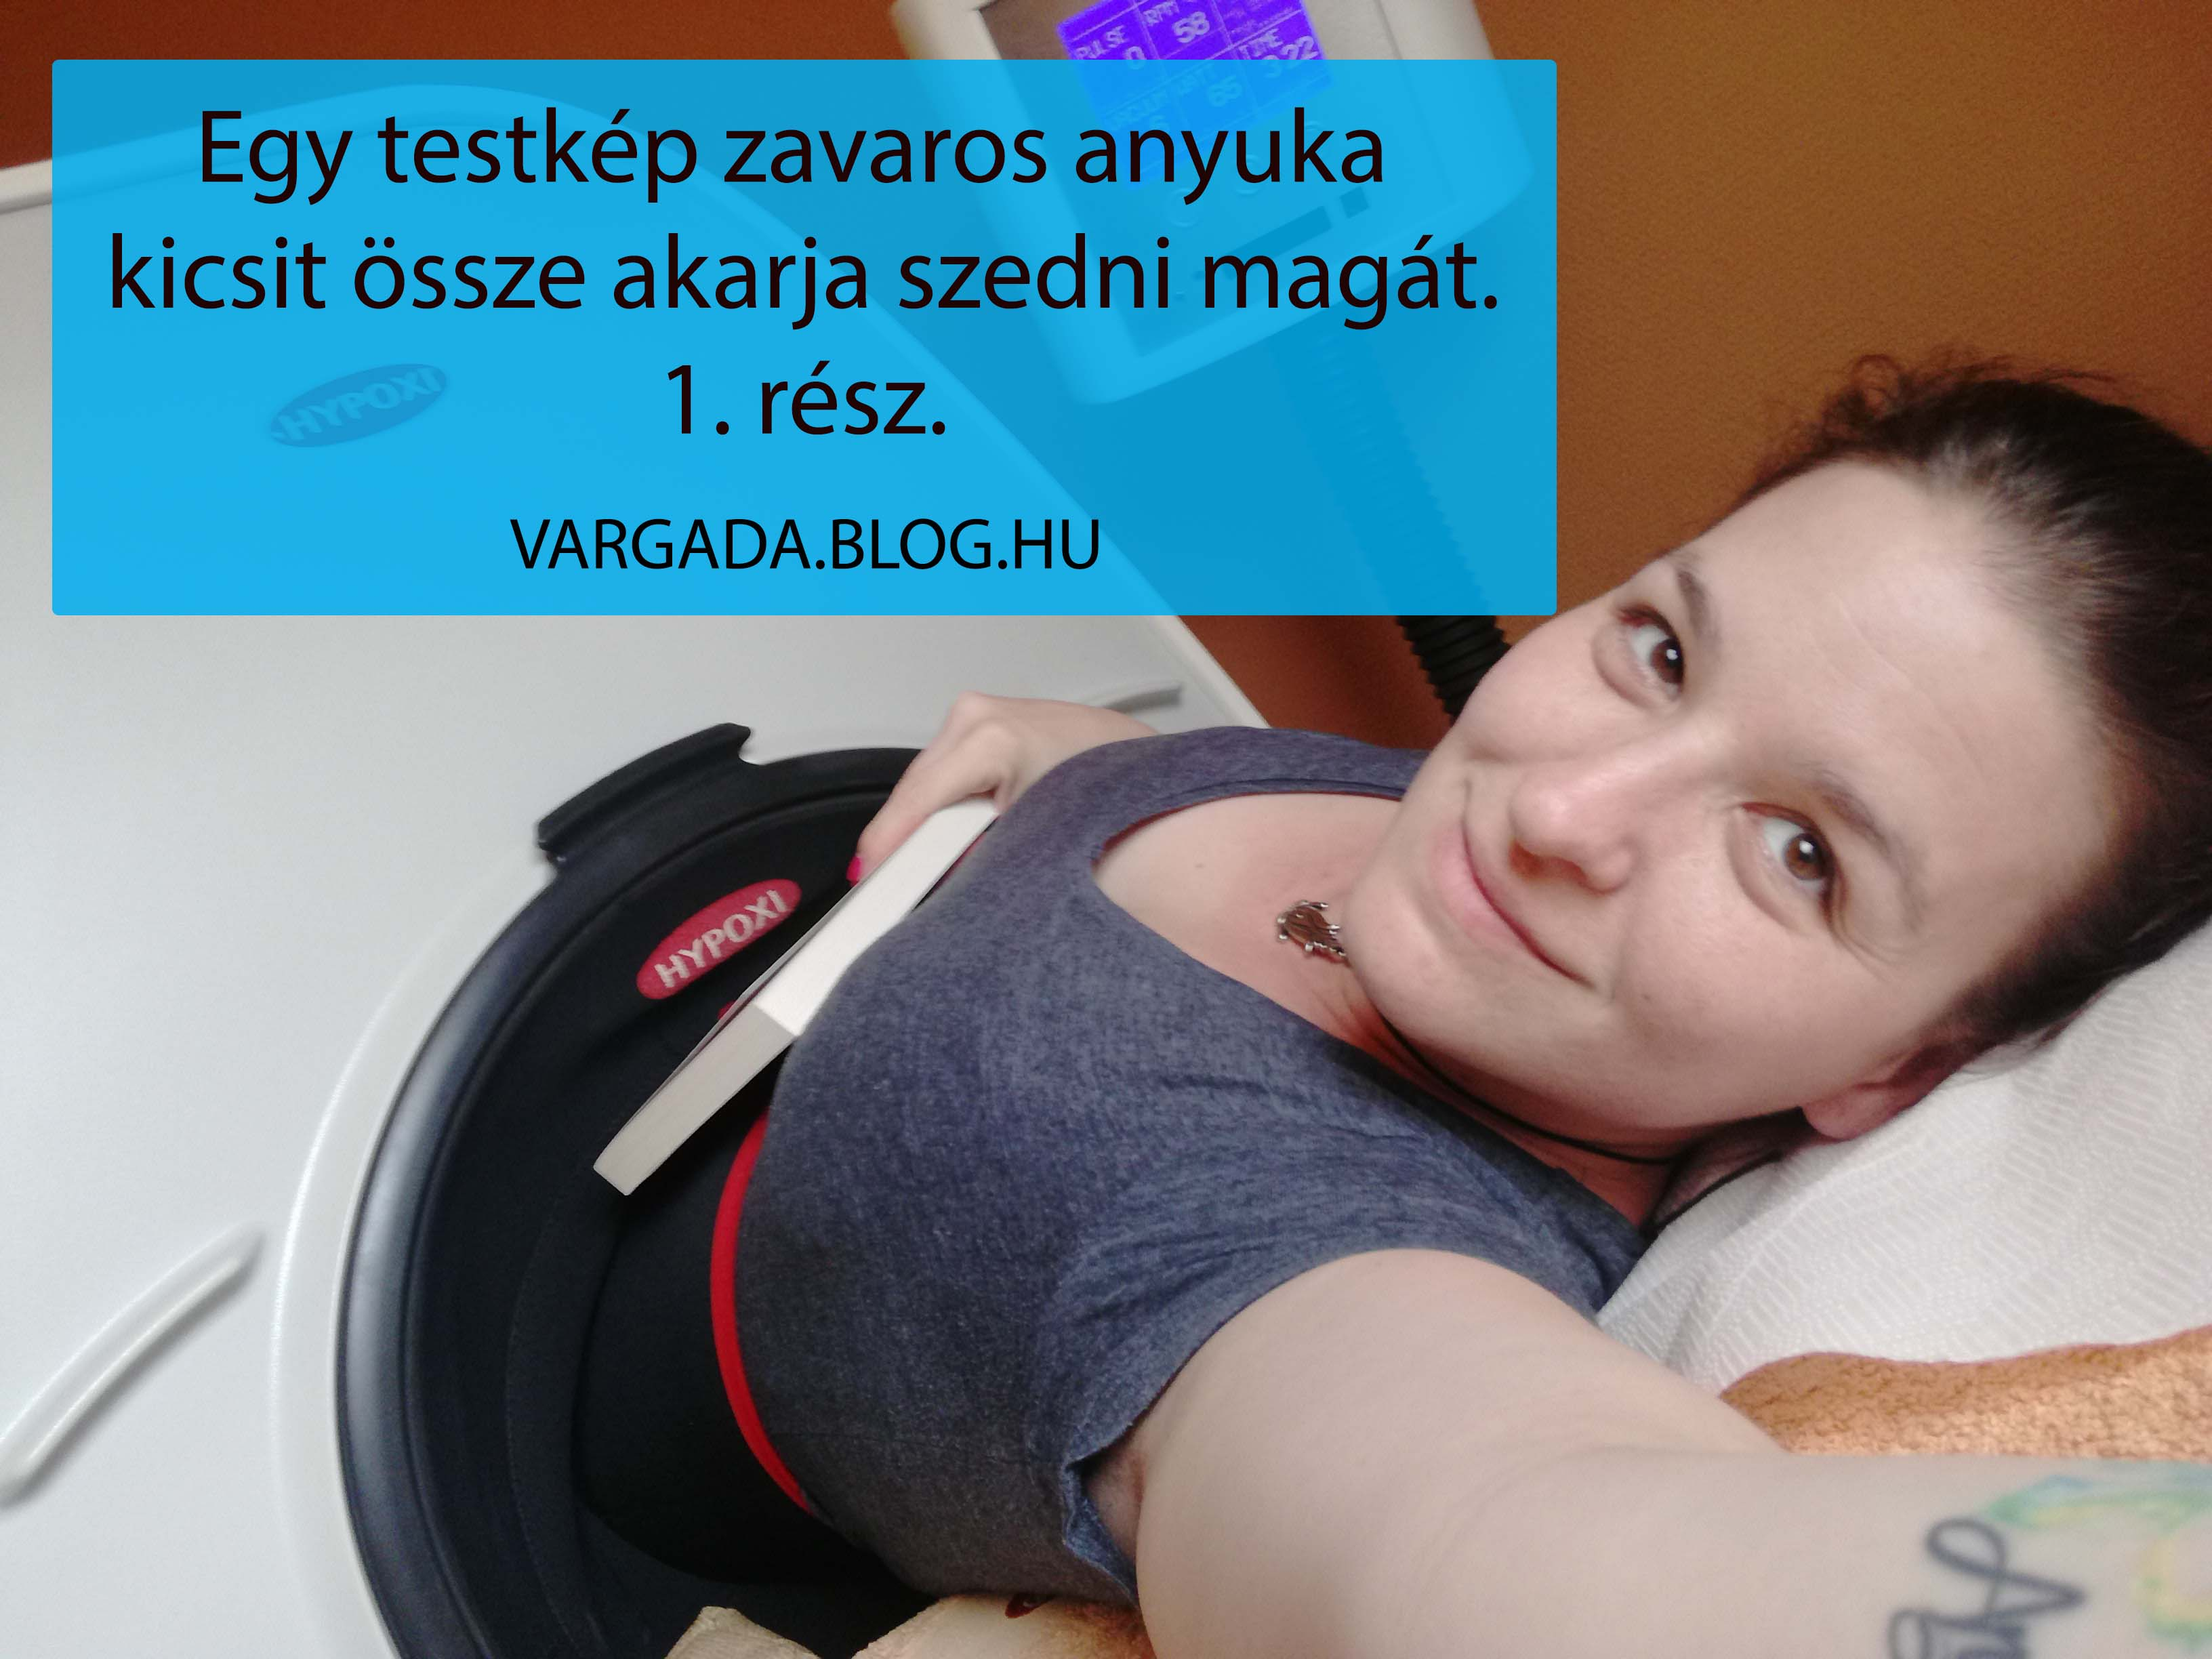 cikk_borito_vargada.jpg